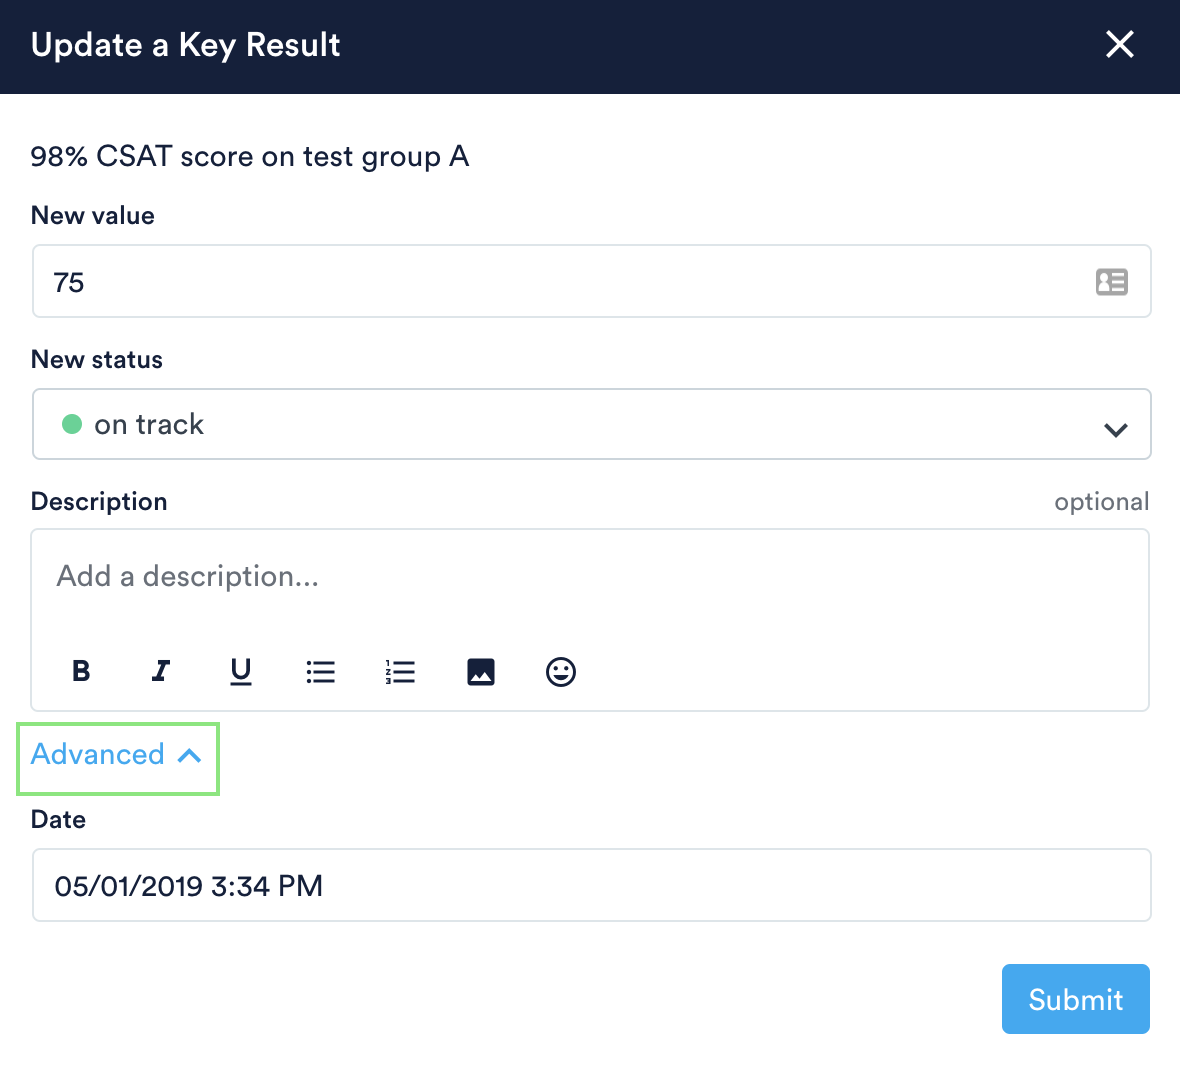 Advanced options to backdate a progress update